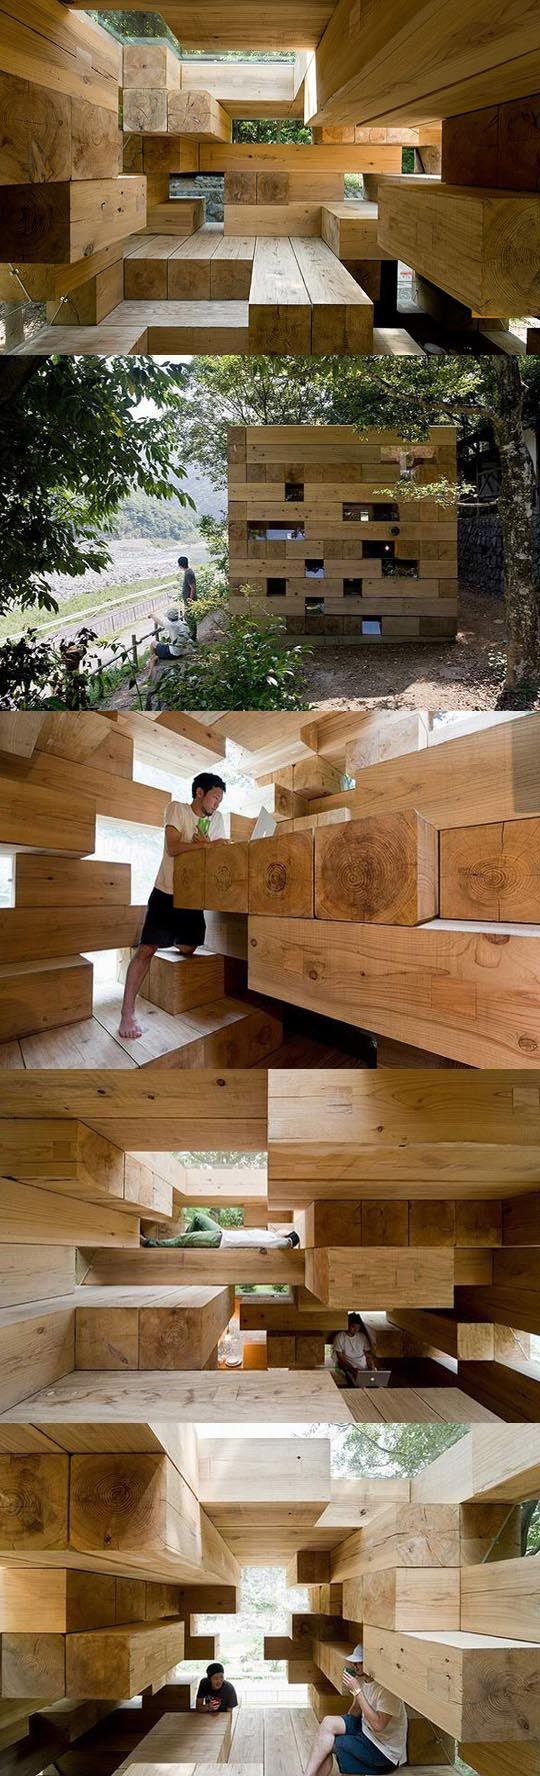 Sou Fujimoto wood house #soufujimoto #finalwoodenhouse